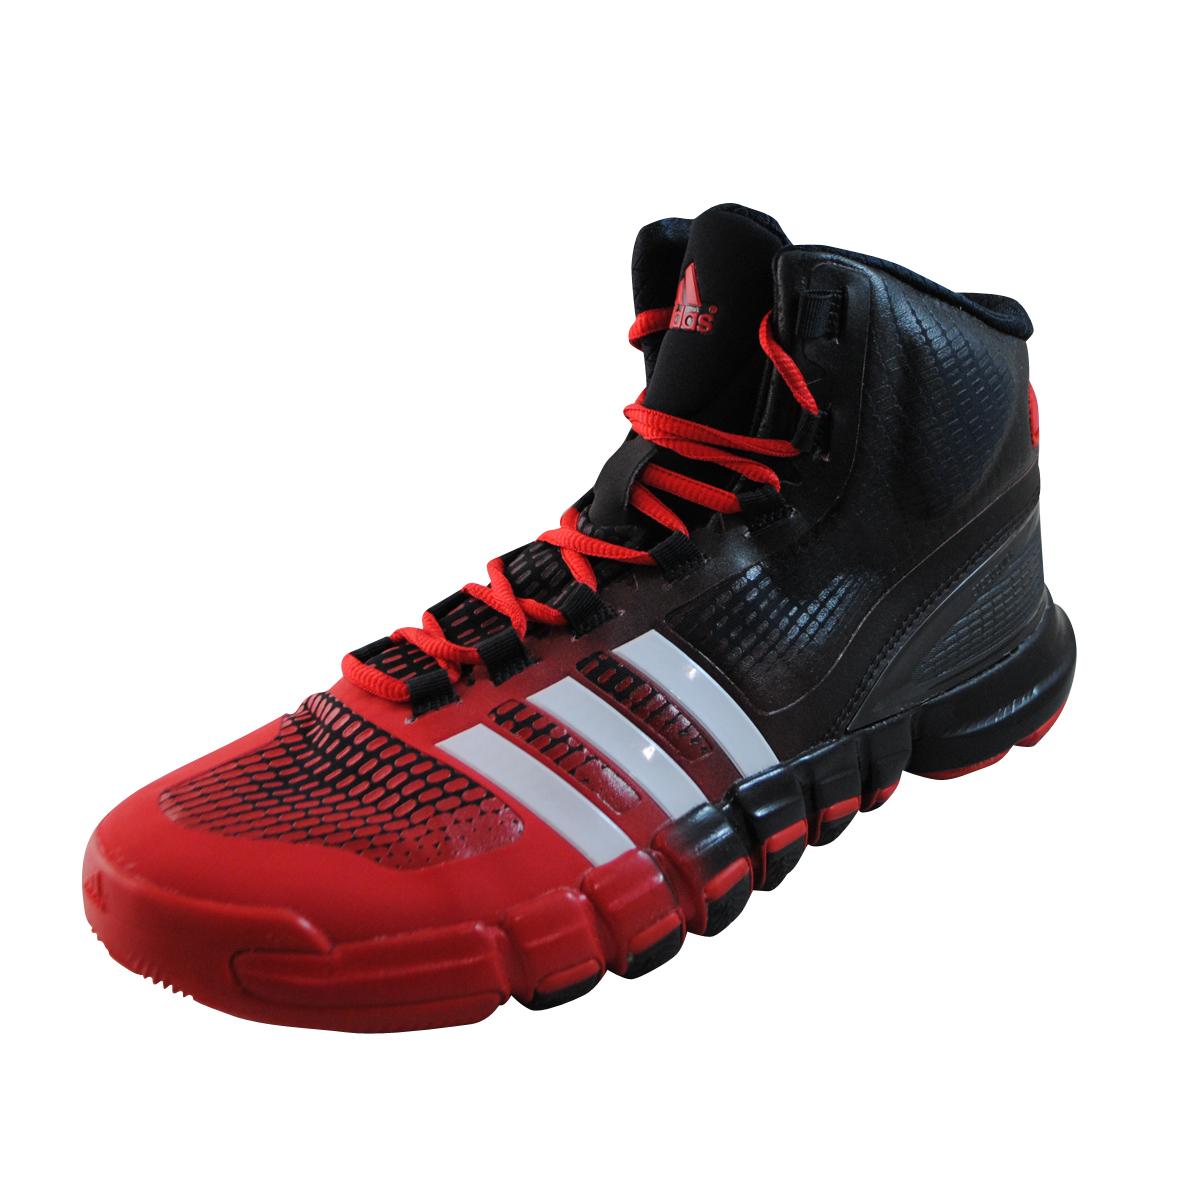 Adidas Basketball Shoes On Ebay